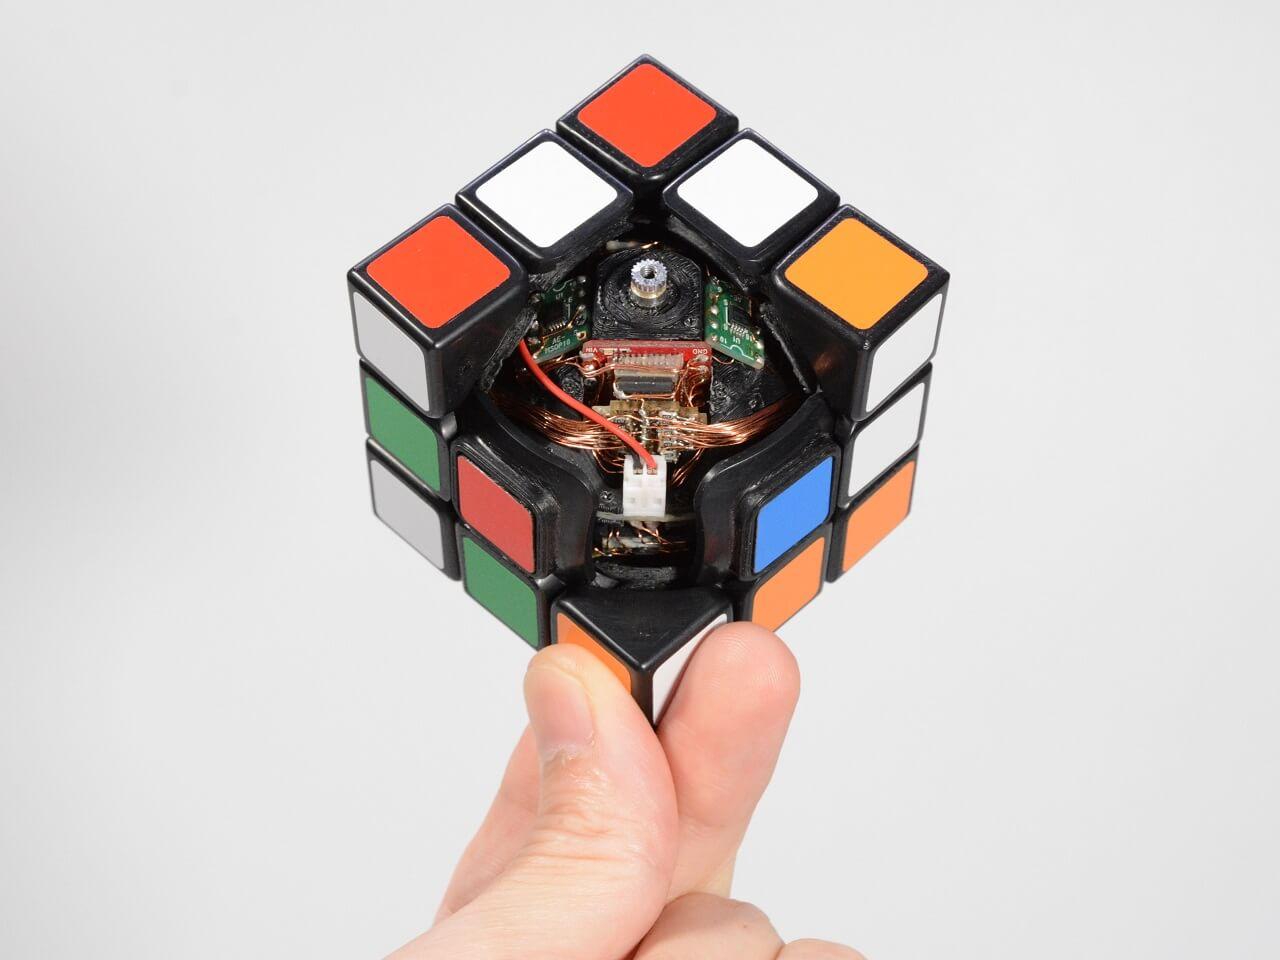 3d-gedruckter zauberwürfel 3d-printed rubriks cube human controller